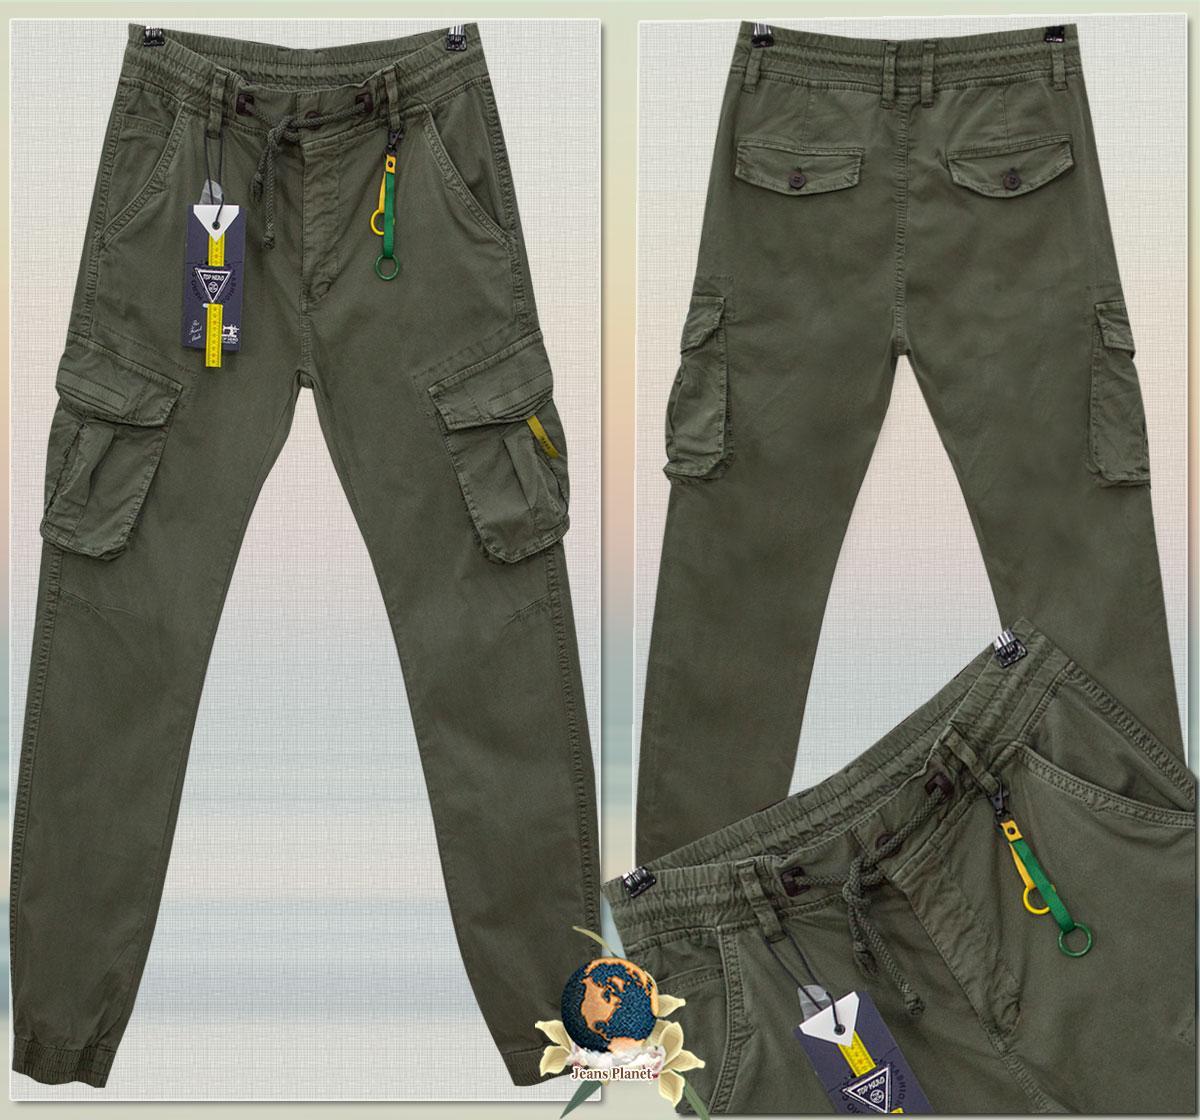 Джинсы мужские ITENO карго на манжете-резинке светлый хаки